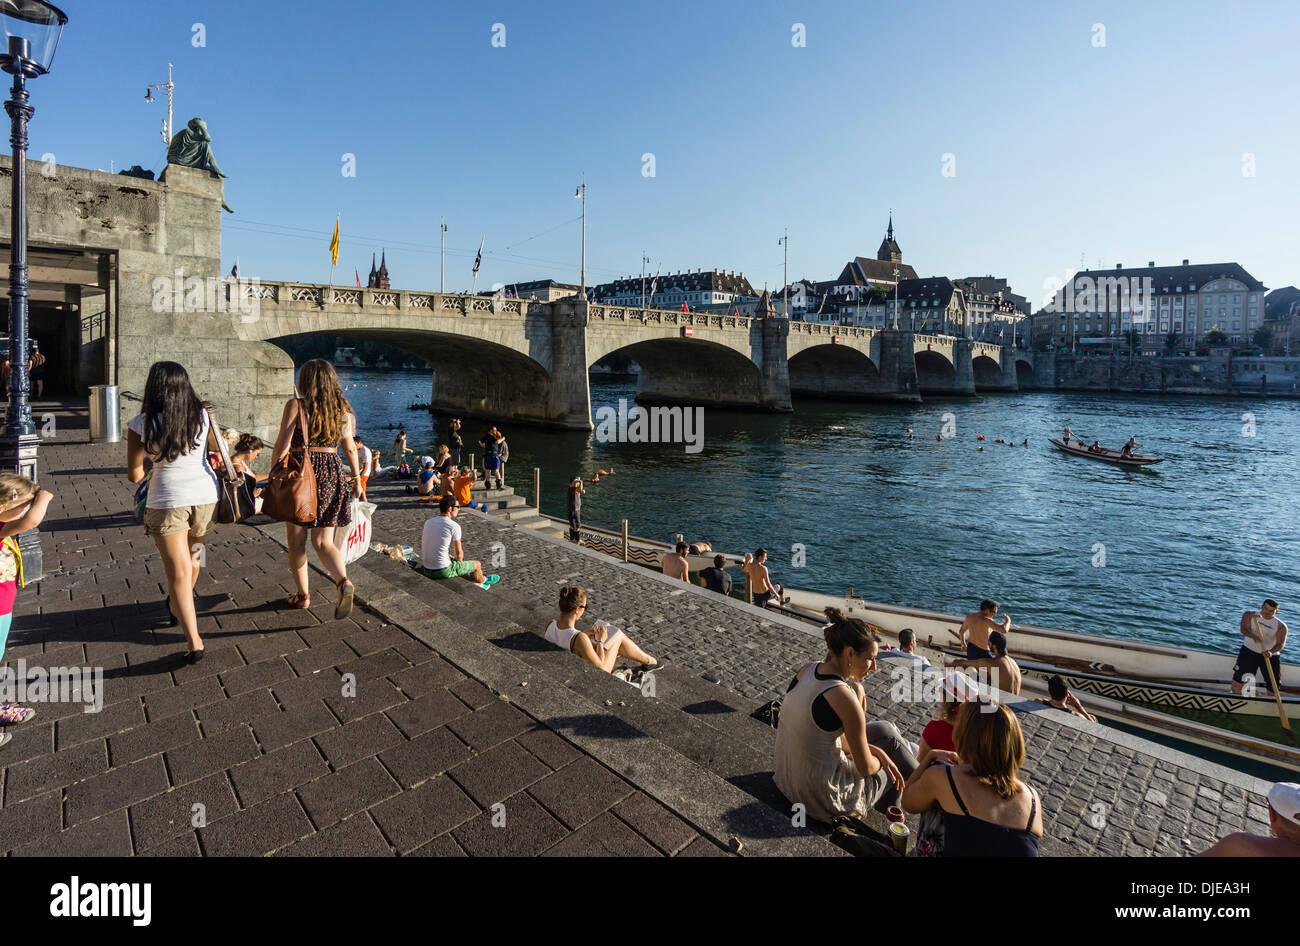 Rhine River in Summer, Middle Bridge, Basel, Switzerland - Stock Image